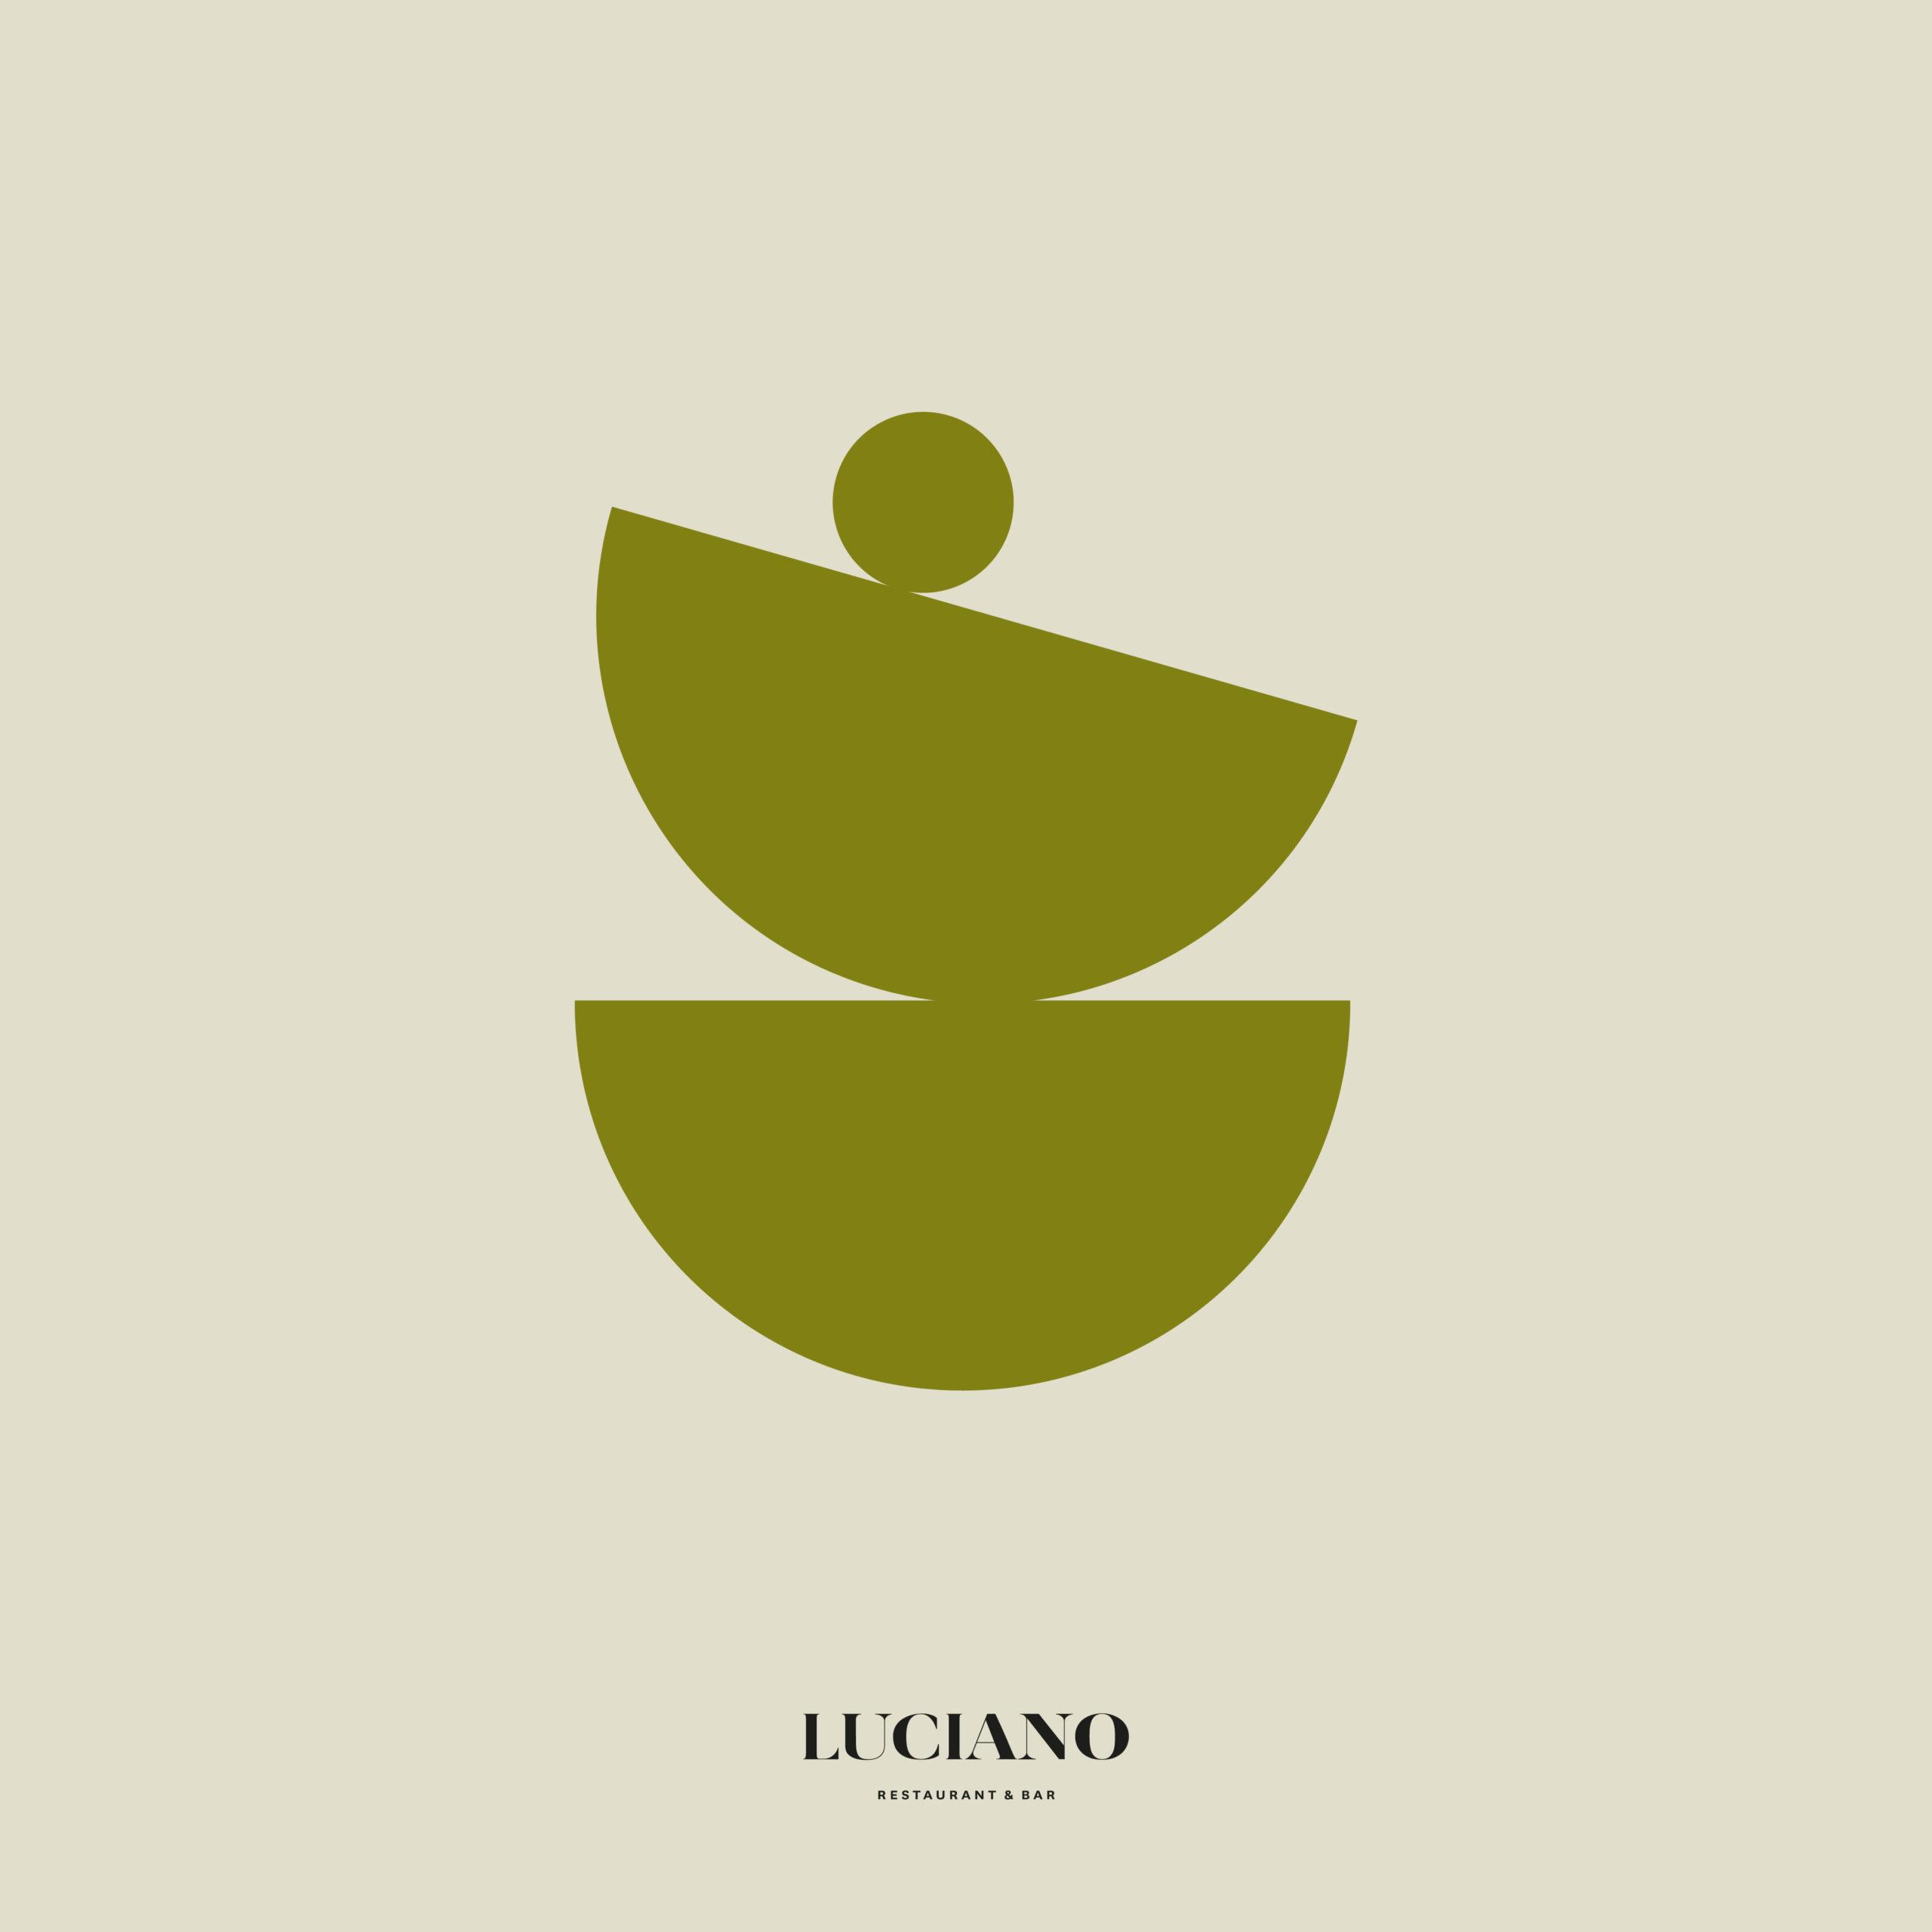 luciano_nulta-ilustracija